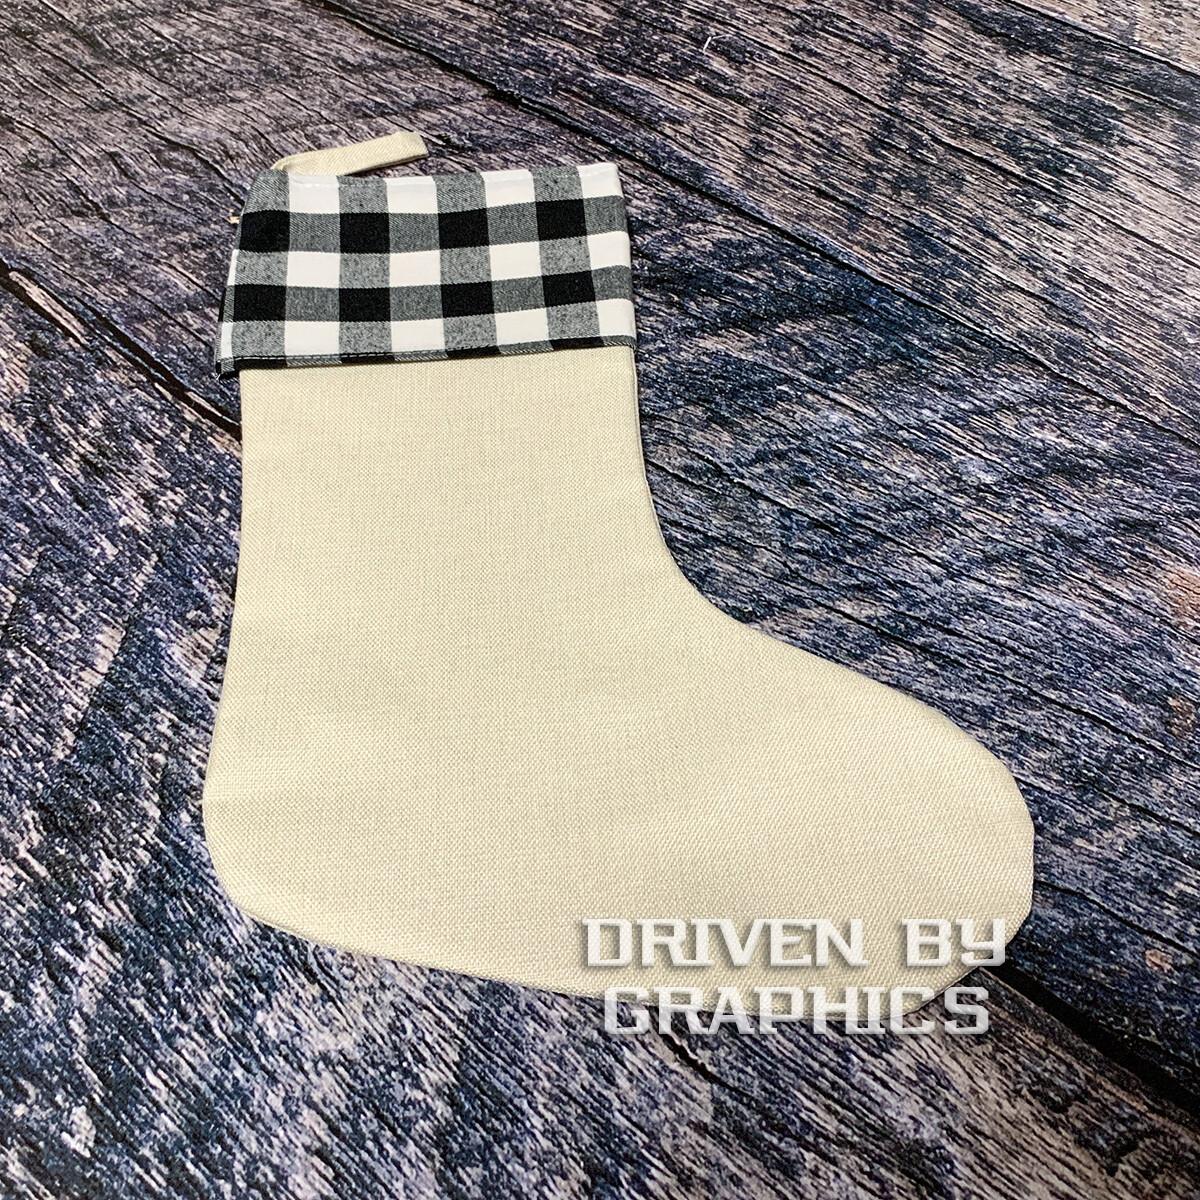 Black & White Buffalo Plaid Stocking w/ Linen Foot